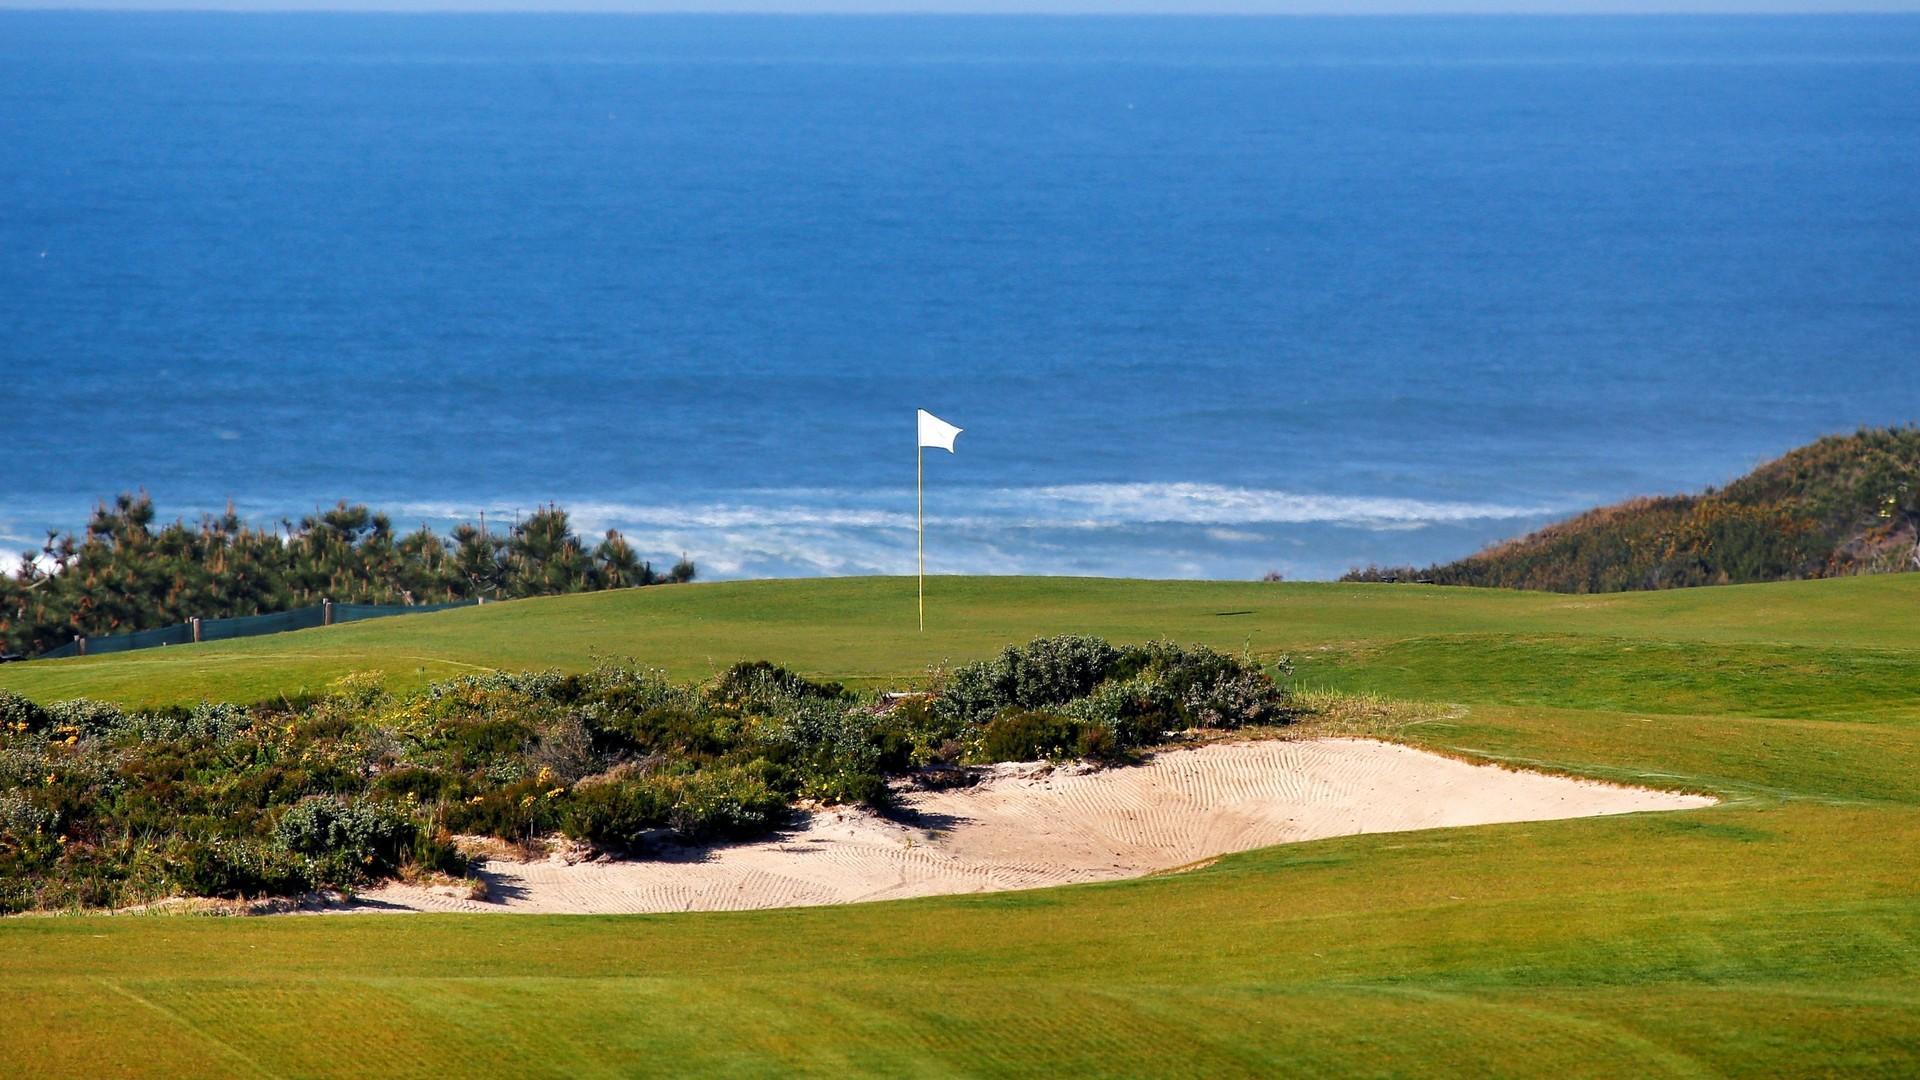 Portuguese golf clubs 9 portuguese golf clubs Portuguese golf clubs: The perfect place for you to relax Portuguese golf clubs 9